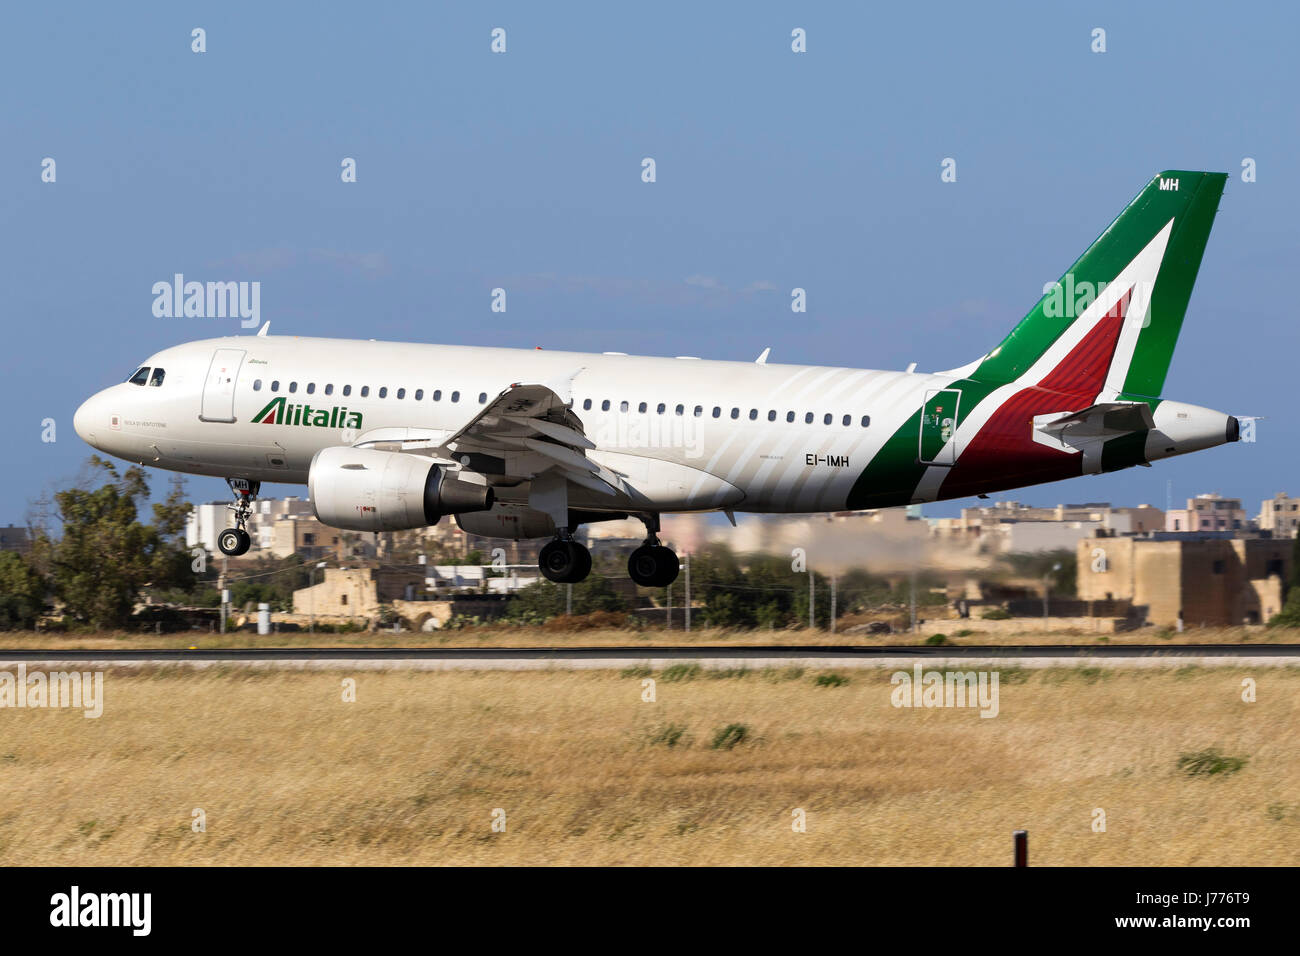 Airbus A319-112 Alitalia [EI-IMH] en la última pista de aterrizaje para Alitalia librea 31. Foto de stock